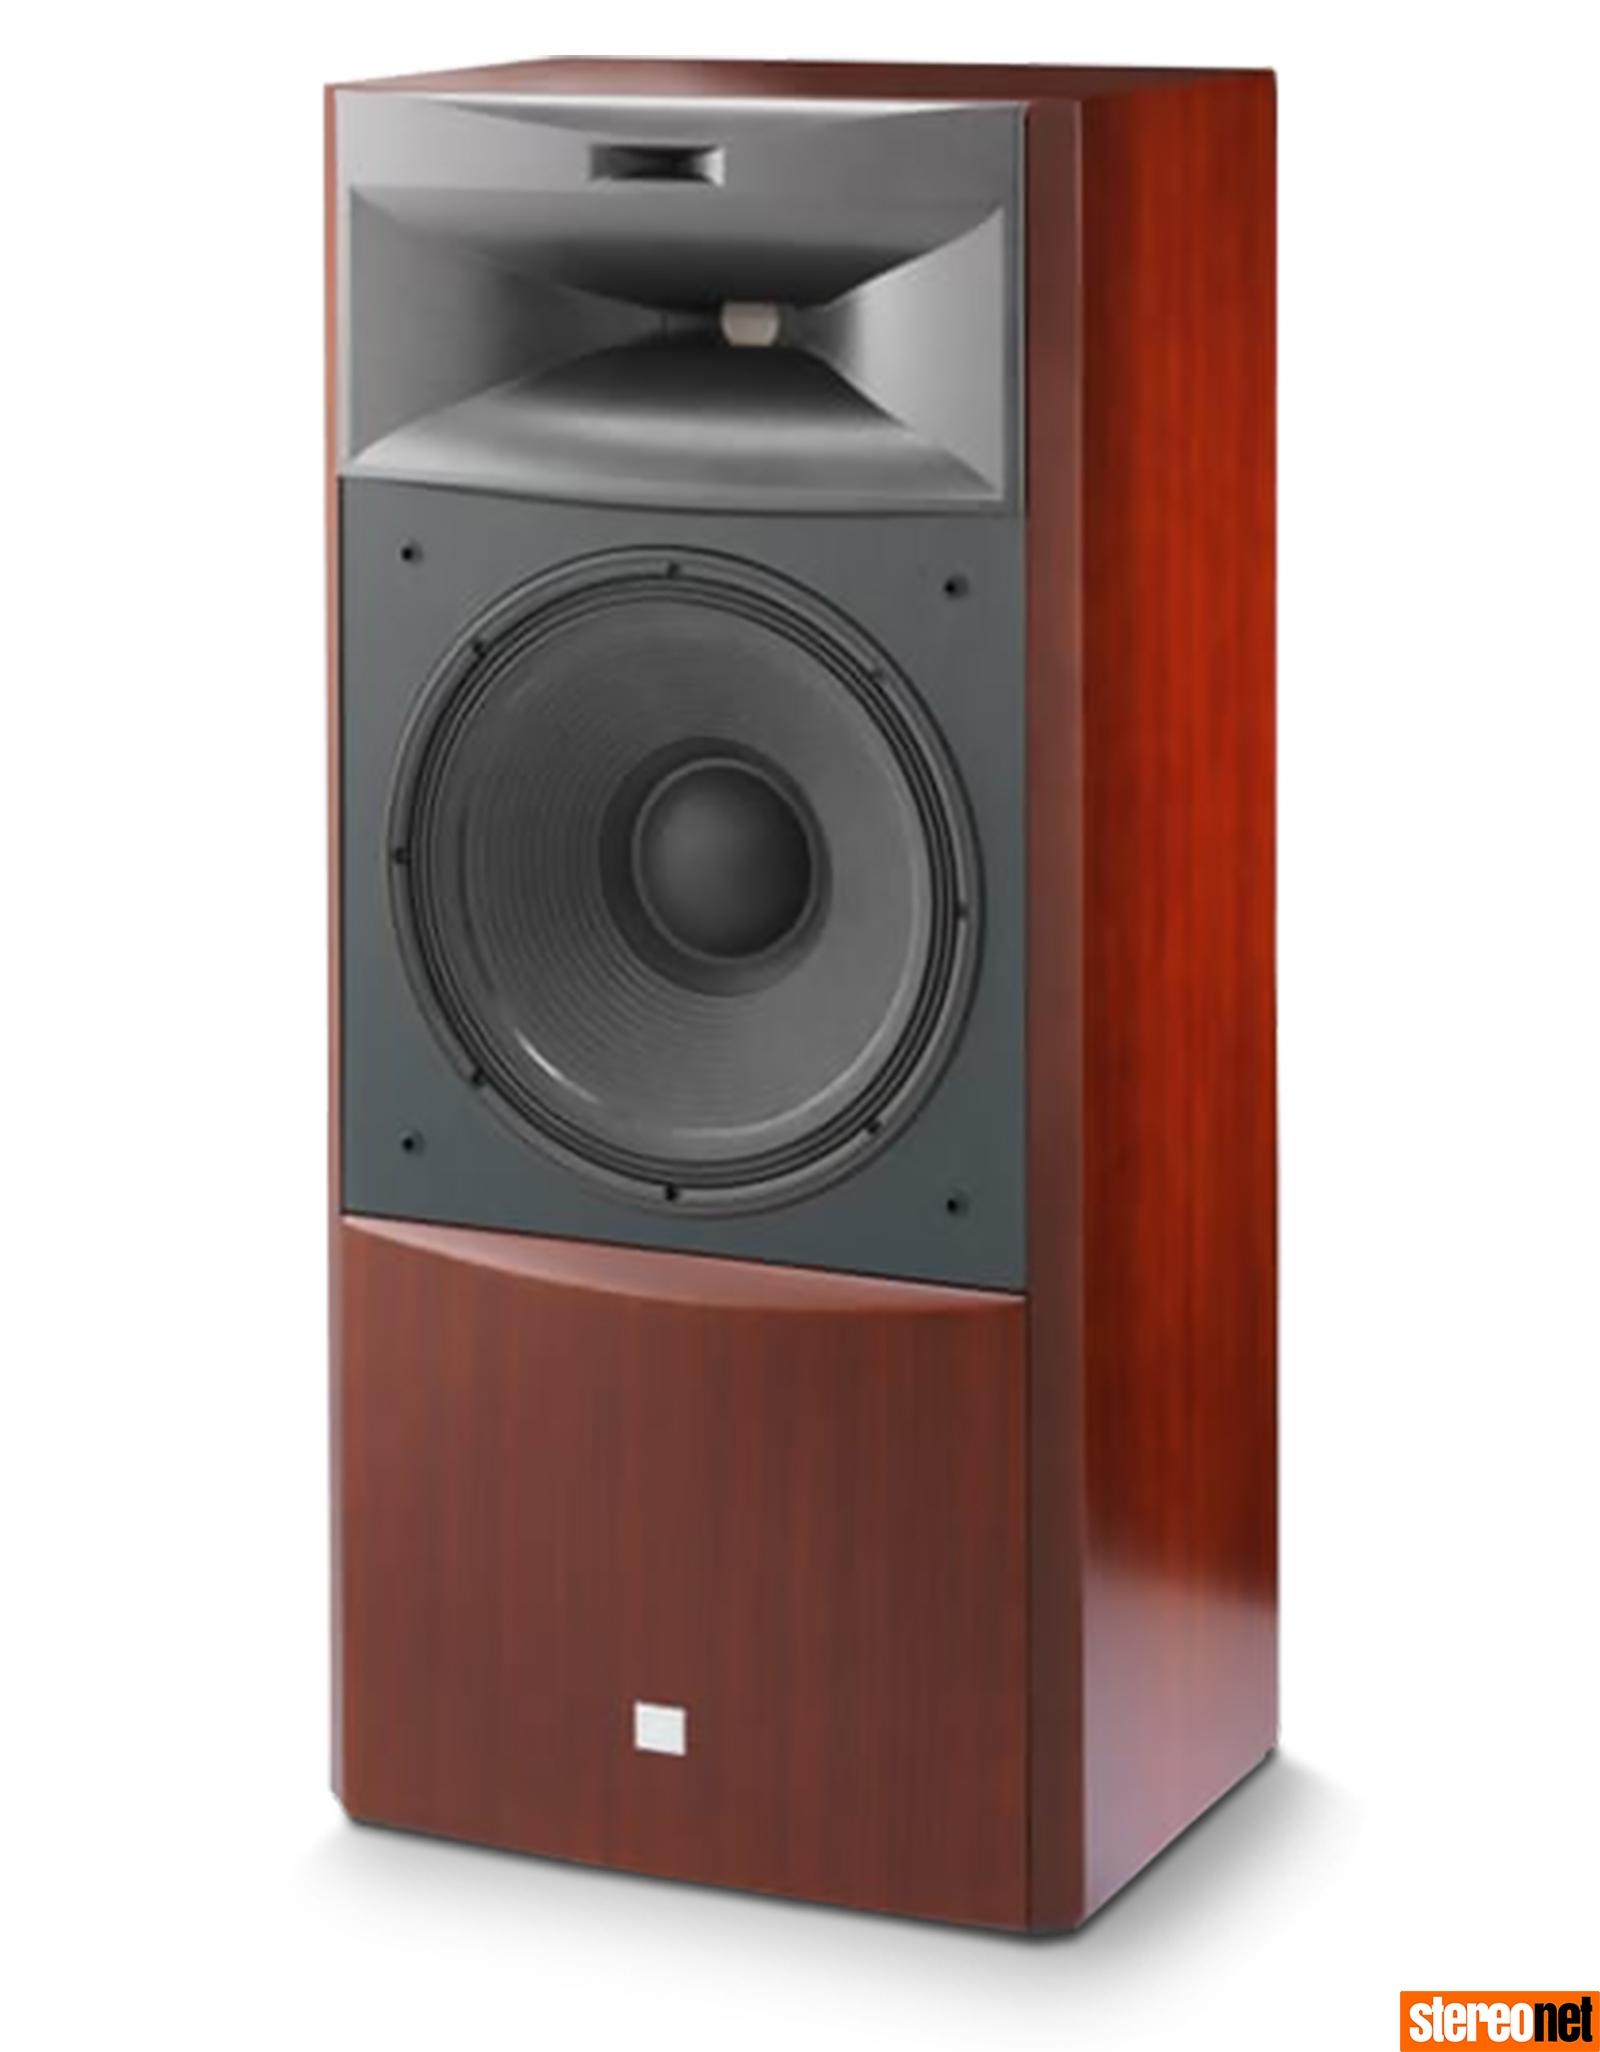 jbl_s4700_speaker_cherry_wood_02_angle_l